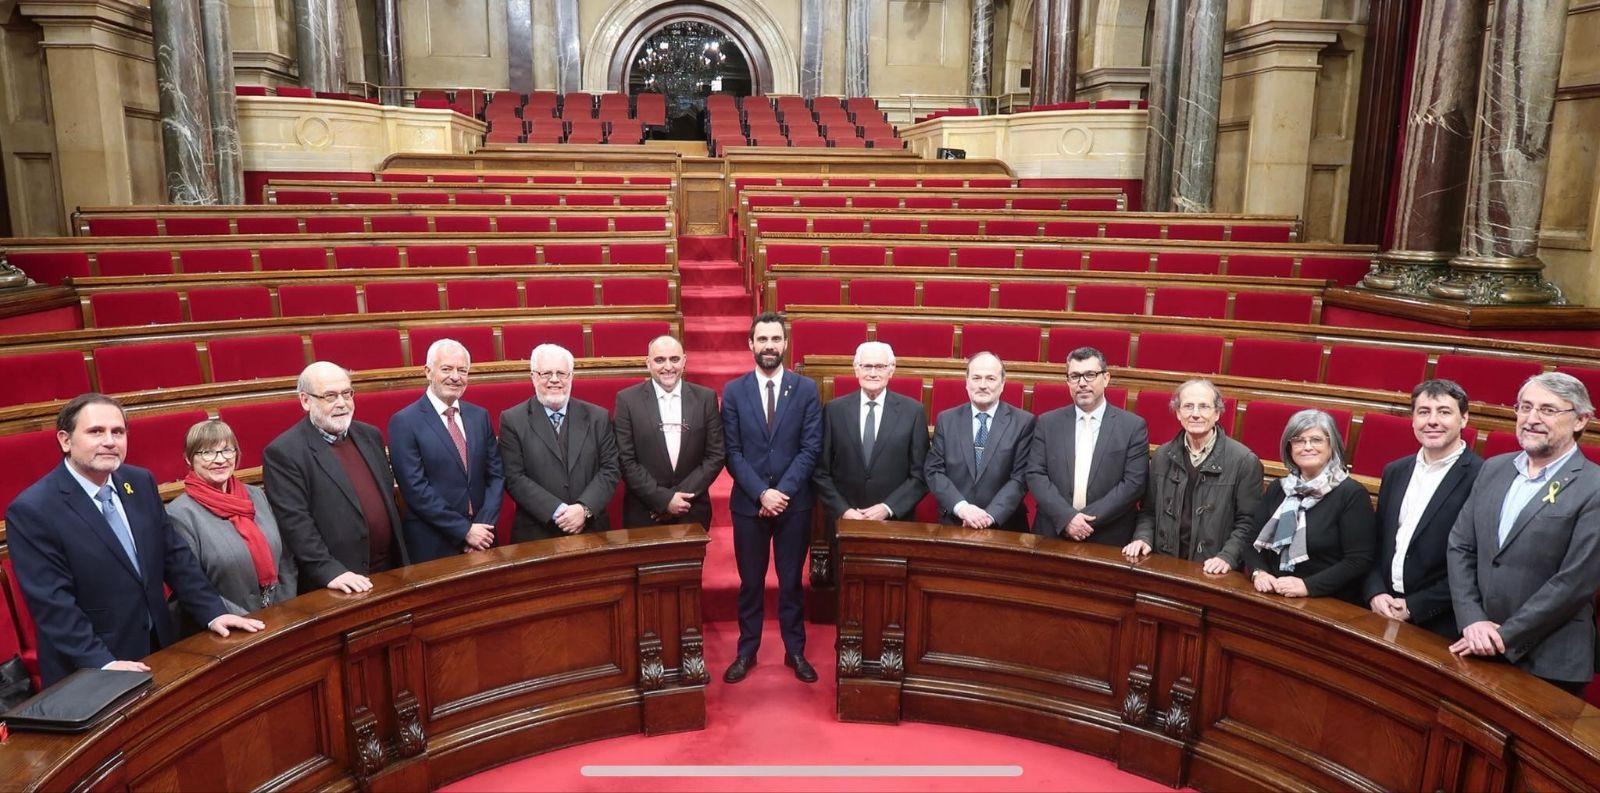 religiones_catalunya_parlament_1